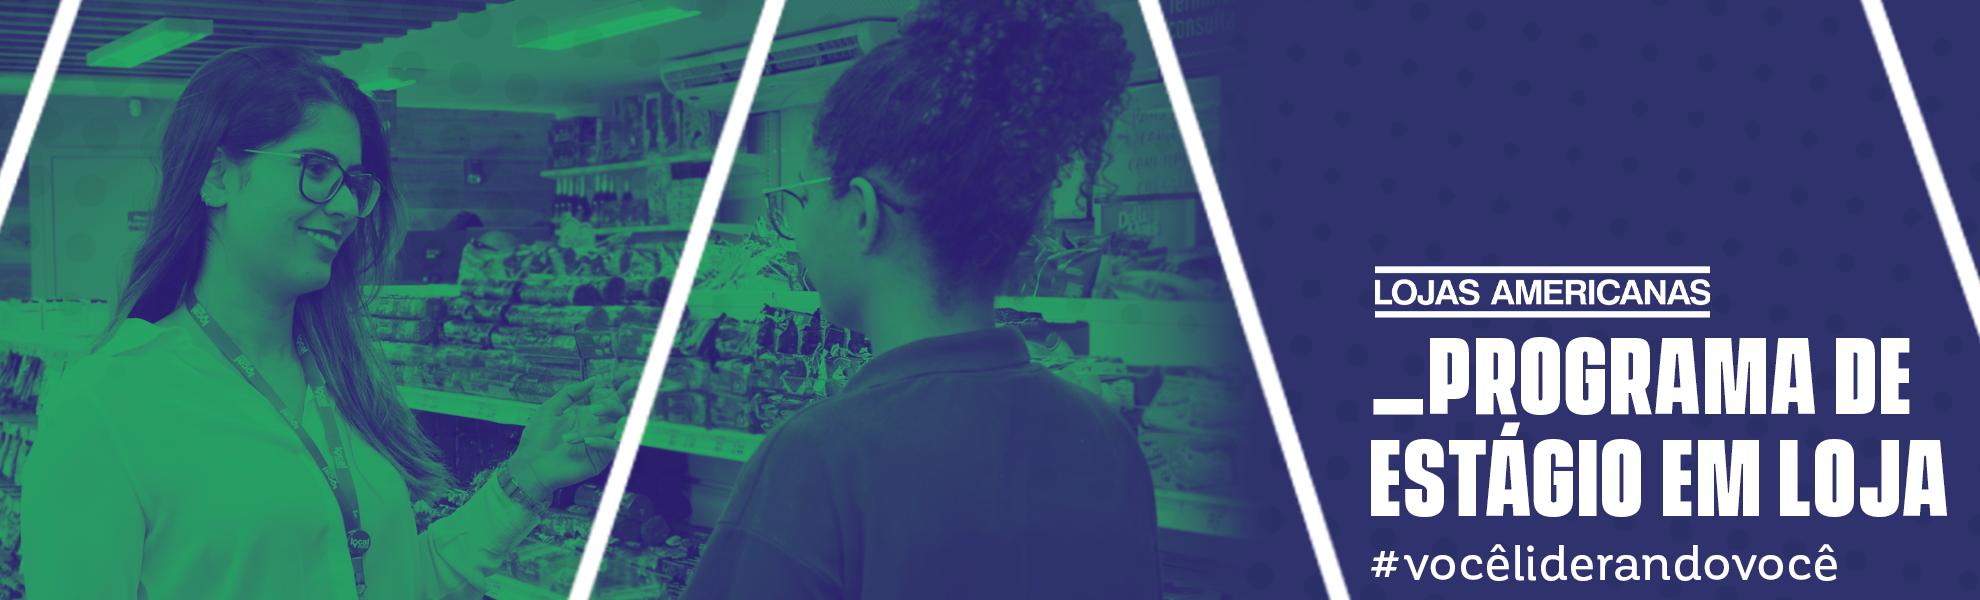 Programa de Estágio em Loja 2020: Lojas Americanas